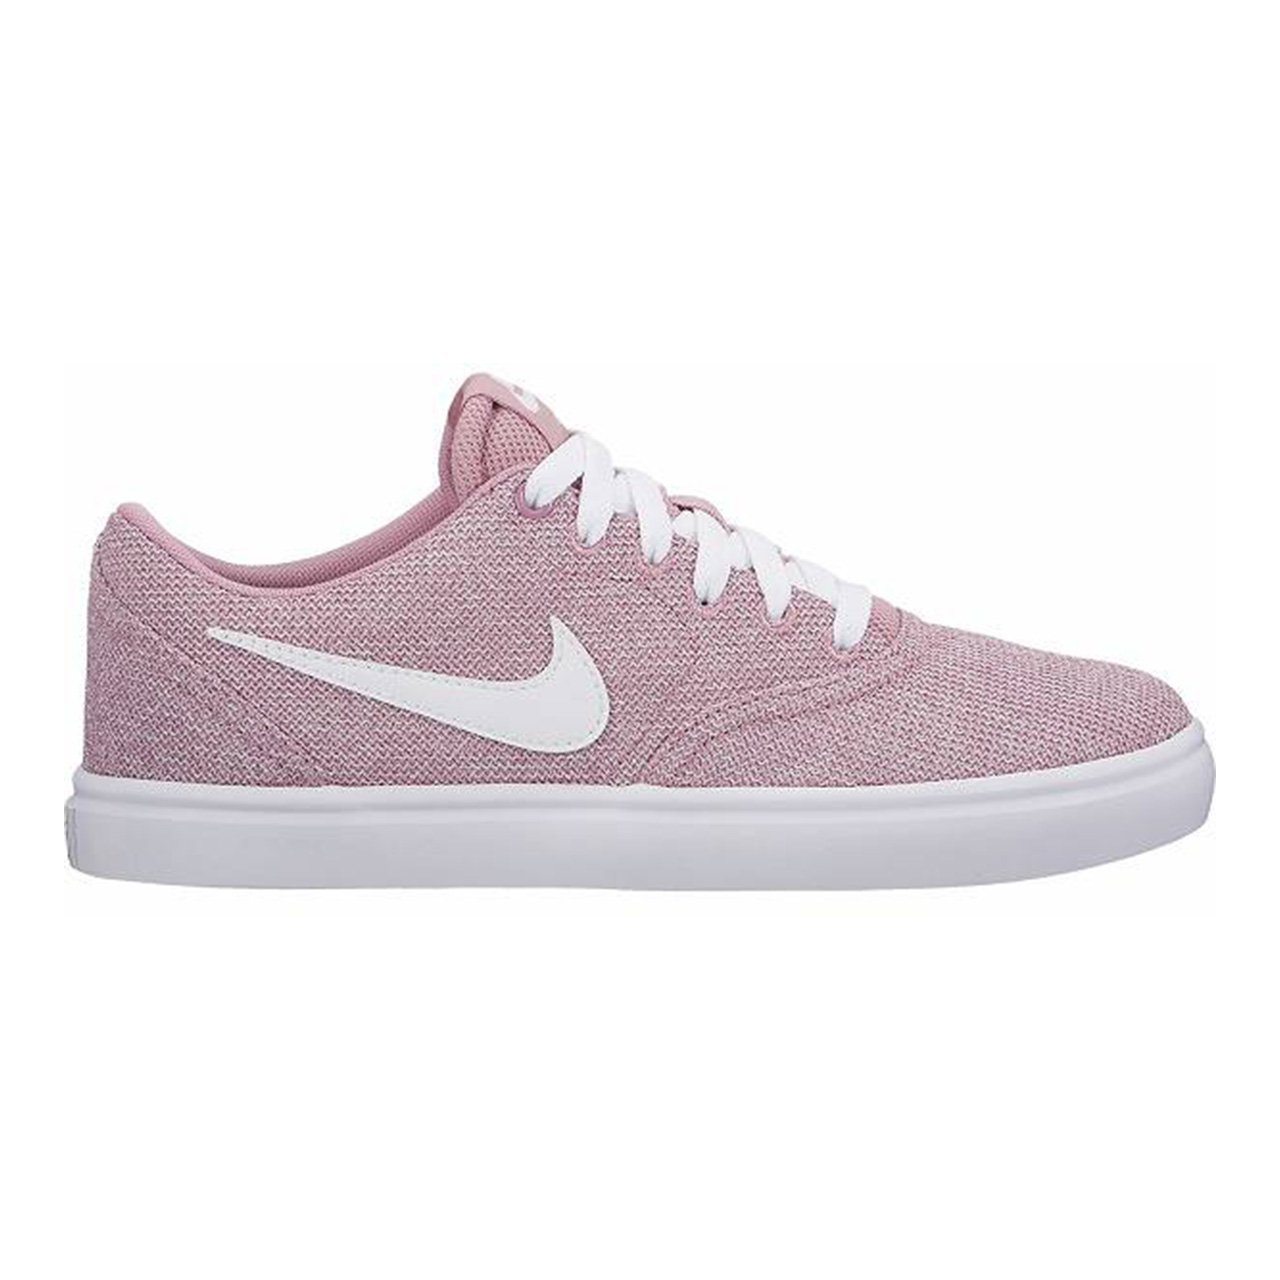 c25cddea7e Amazon.com | Nike Women's WMNS Sb Check Solar CNVS Low-Top Sneakers |  Fashion Sneakers